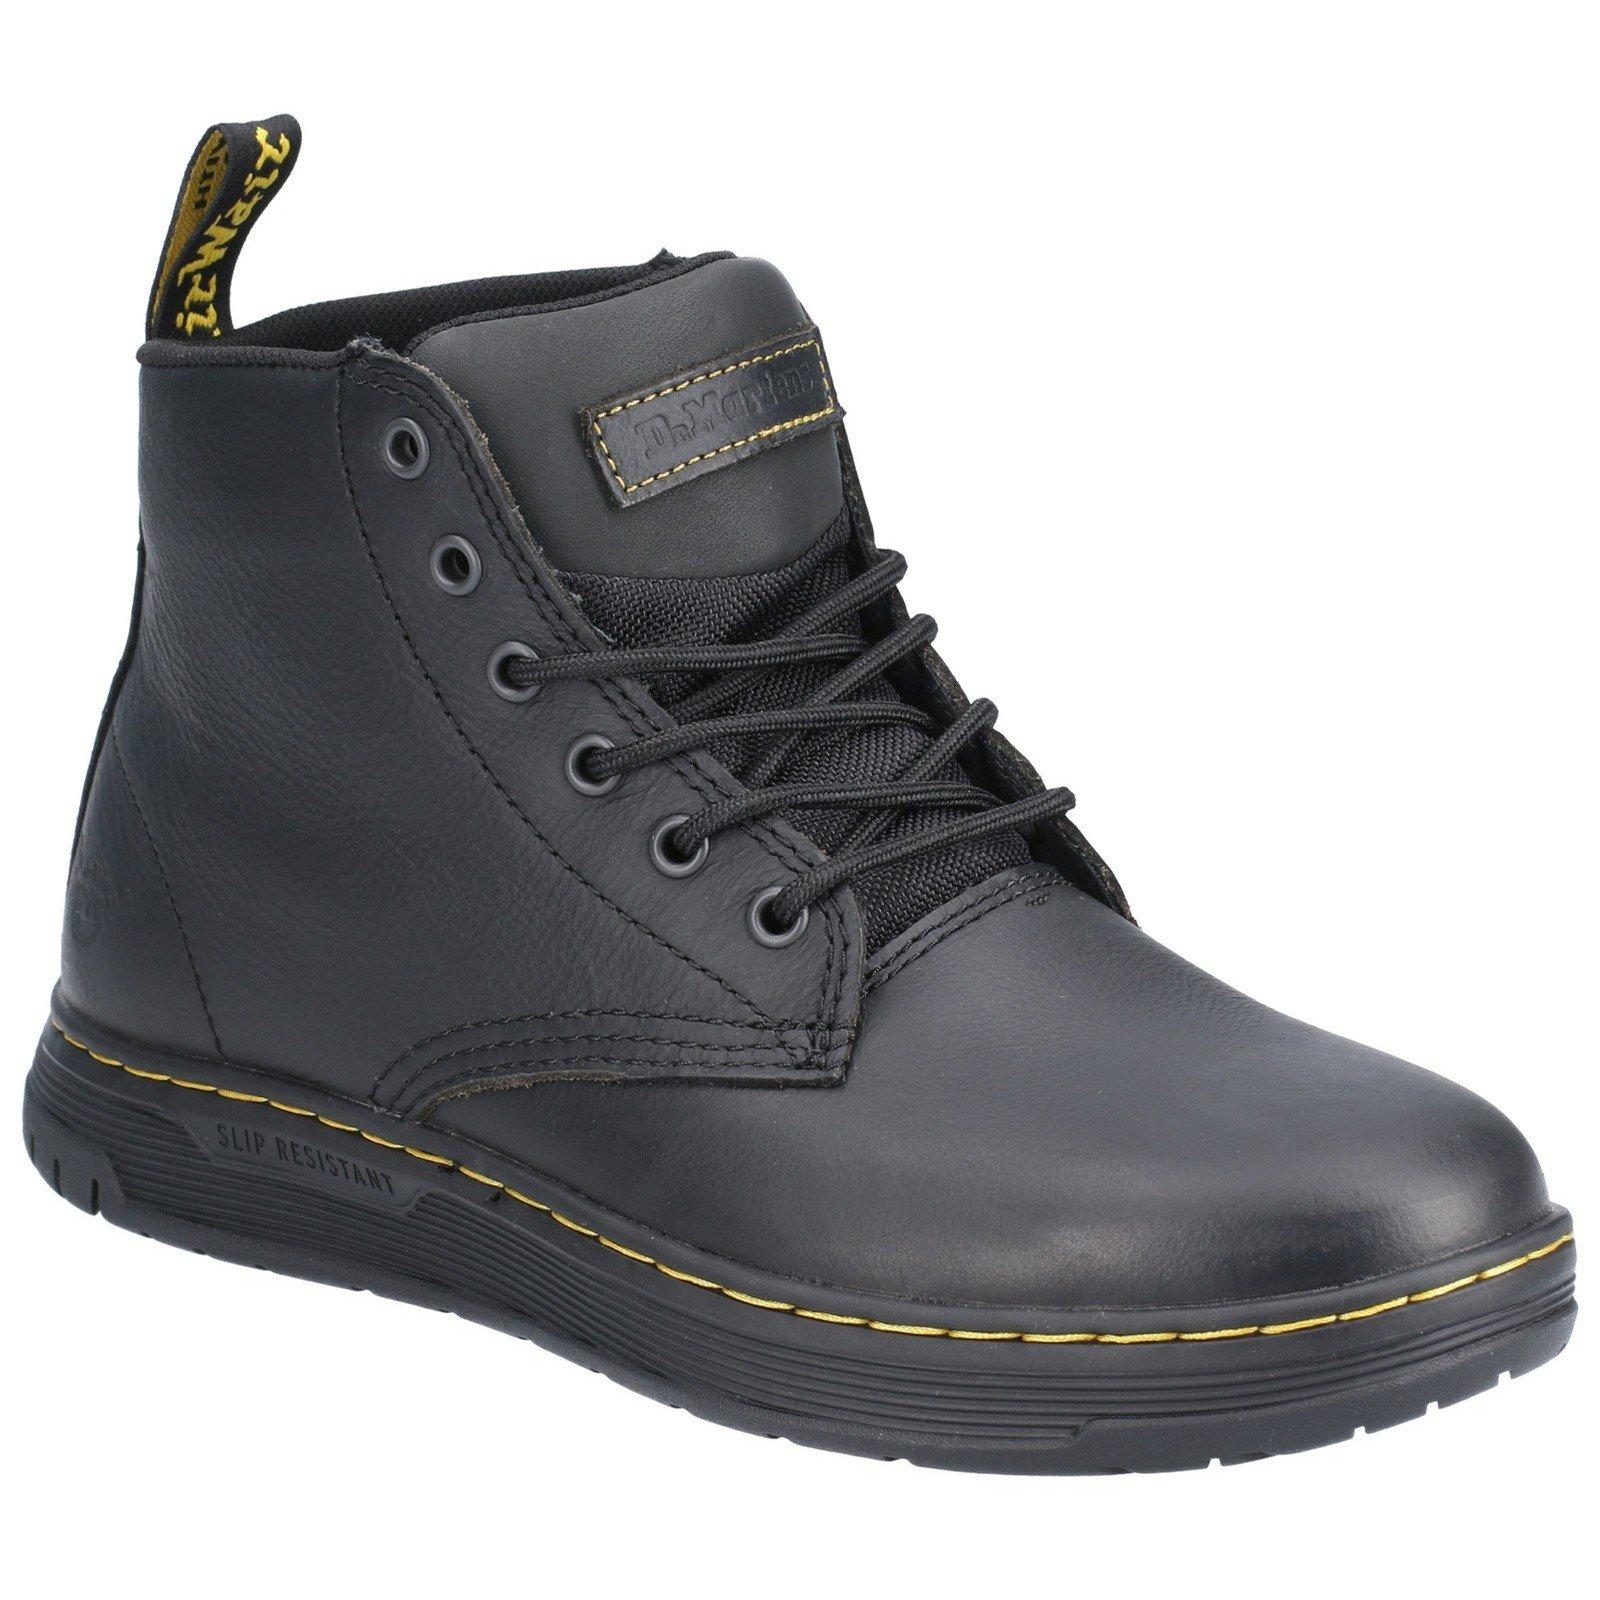 Dr Martens Men's Amwell Slip Resistant Leather Boot Black 29508 - Black 3